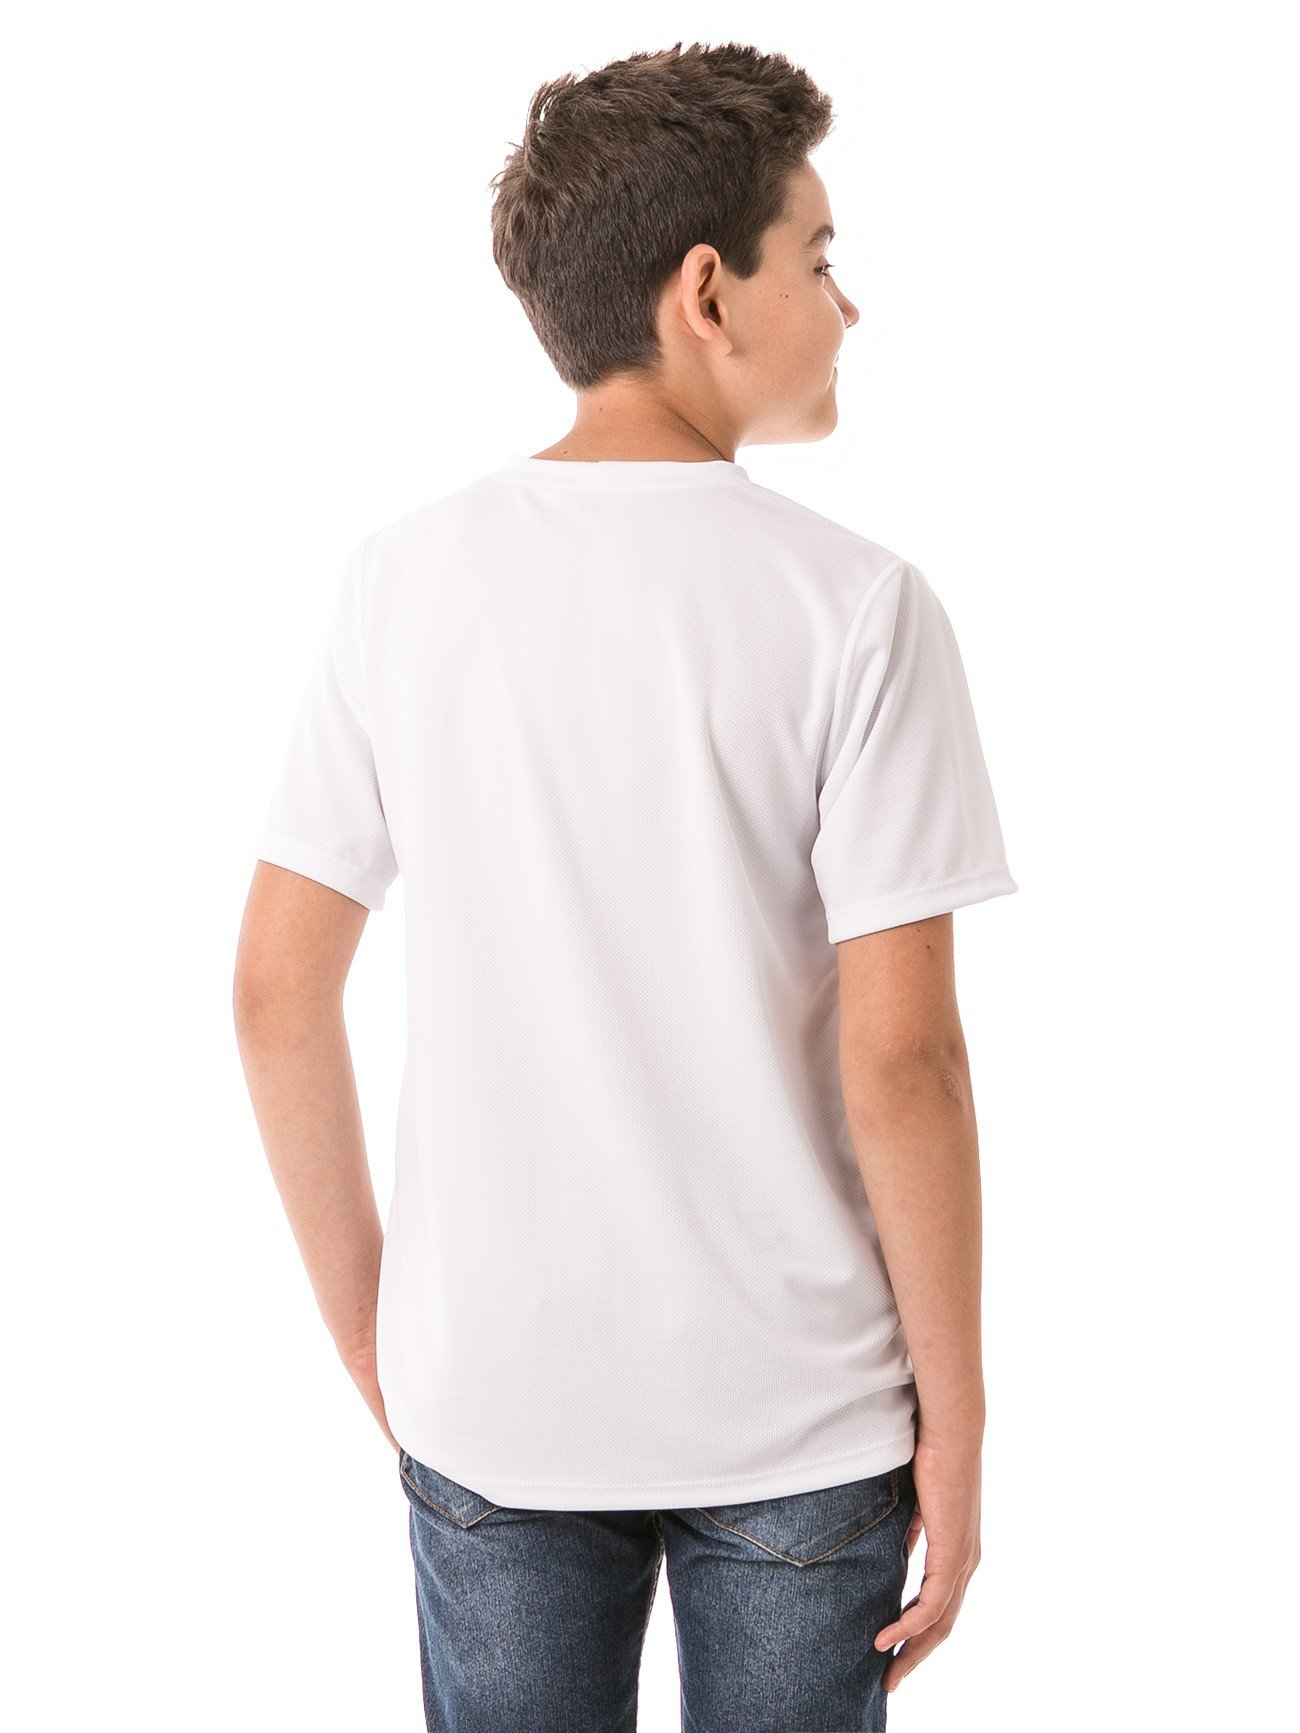 infantil masculinas t shirt curta dry branca costas b